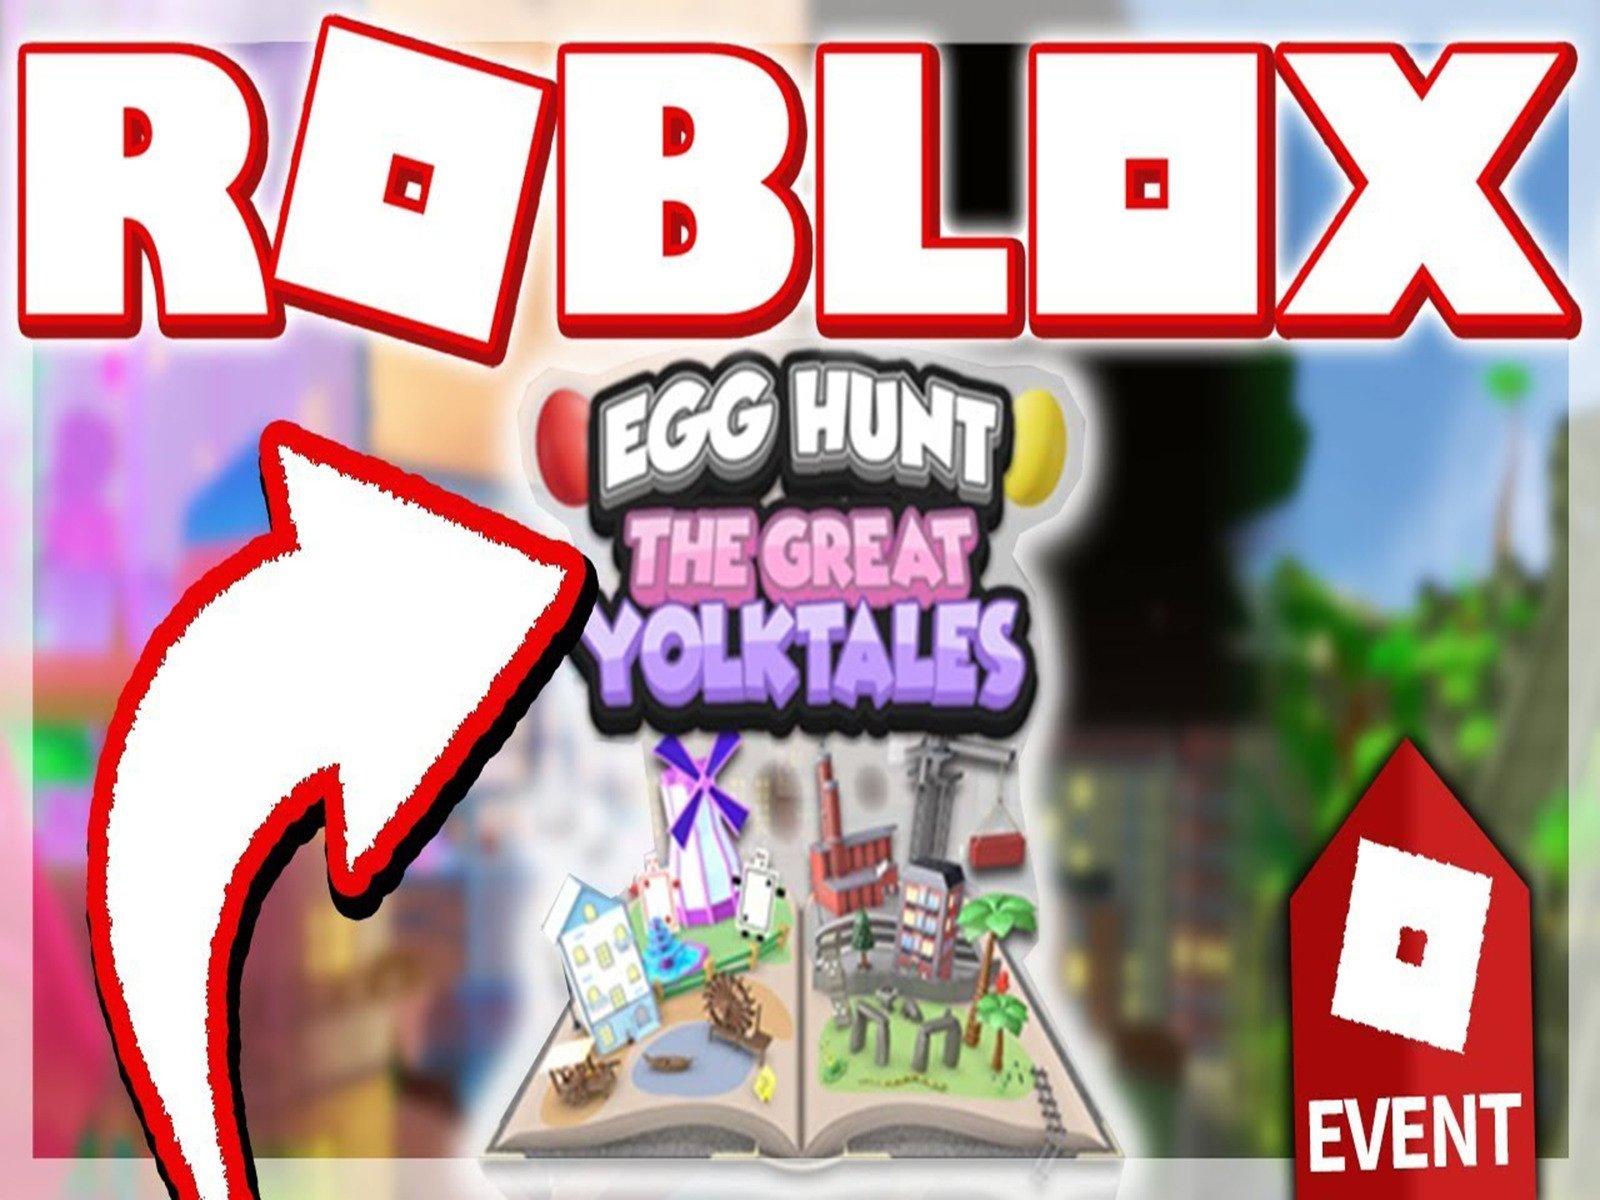 Egg Hunt Event Roblox 2019 List Watch Clip Twiistedpandora Prime Video